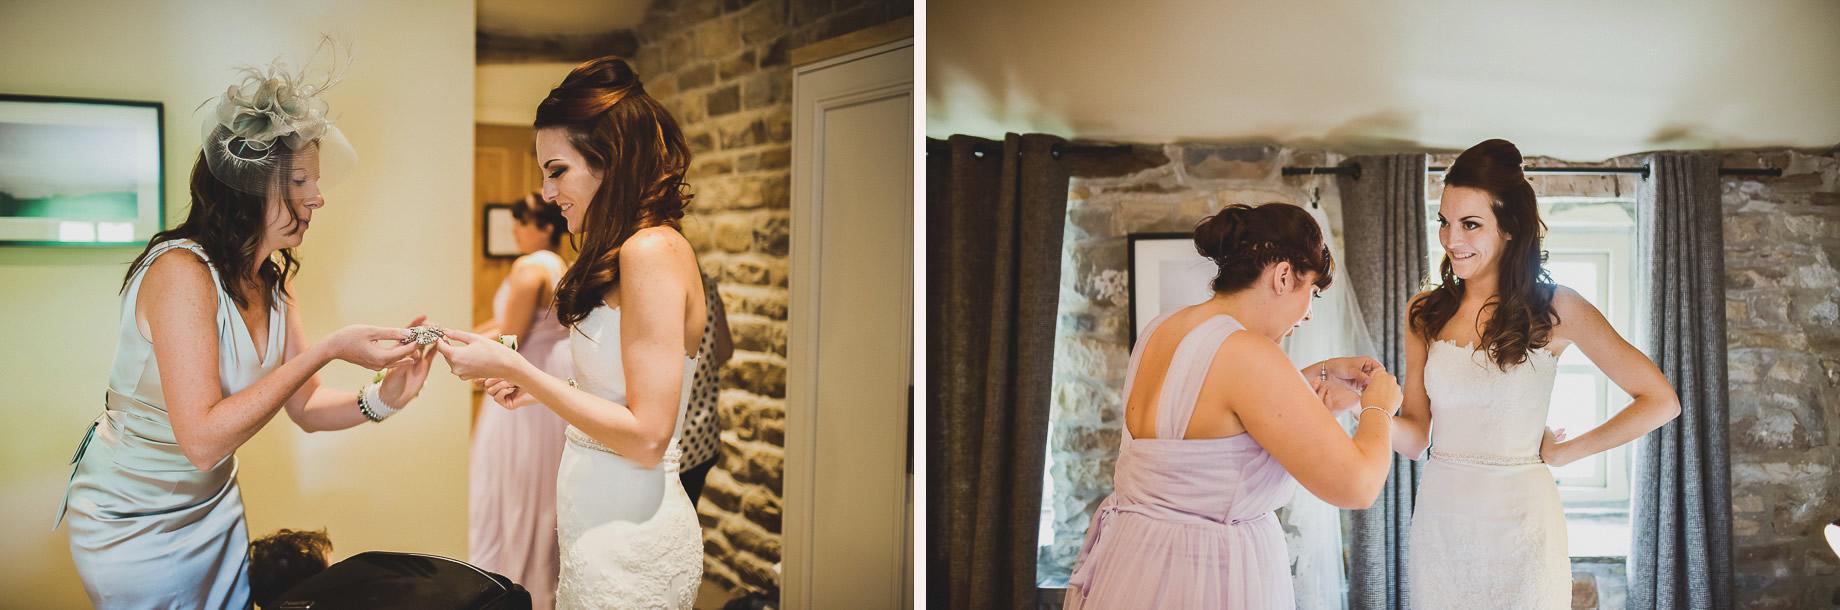 Helen and Matt's Wedding at Mitton Hall 155